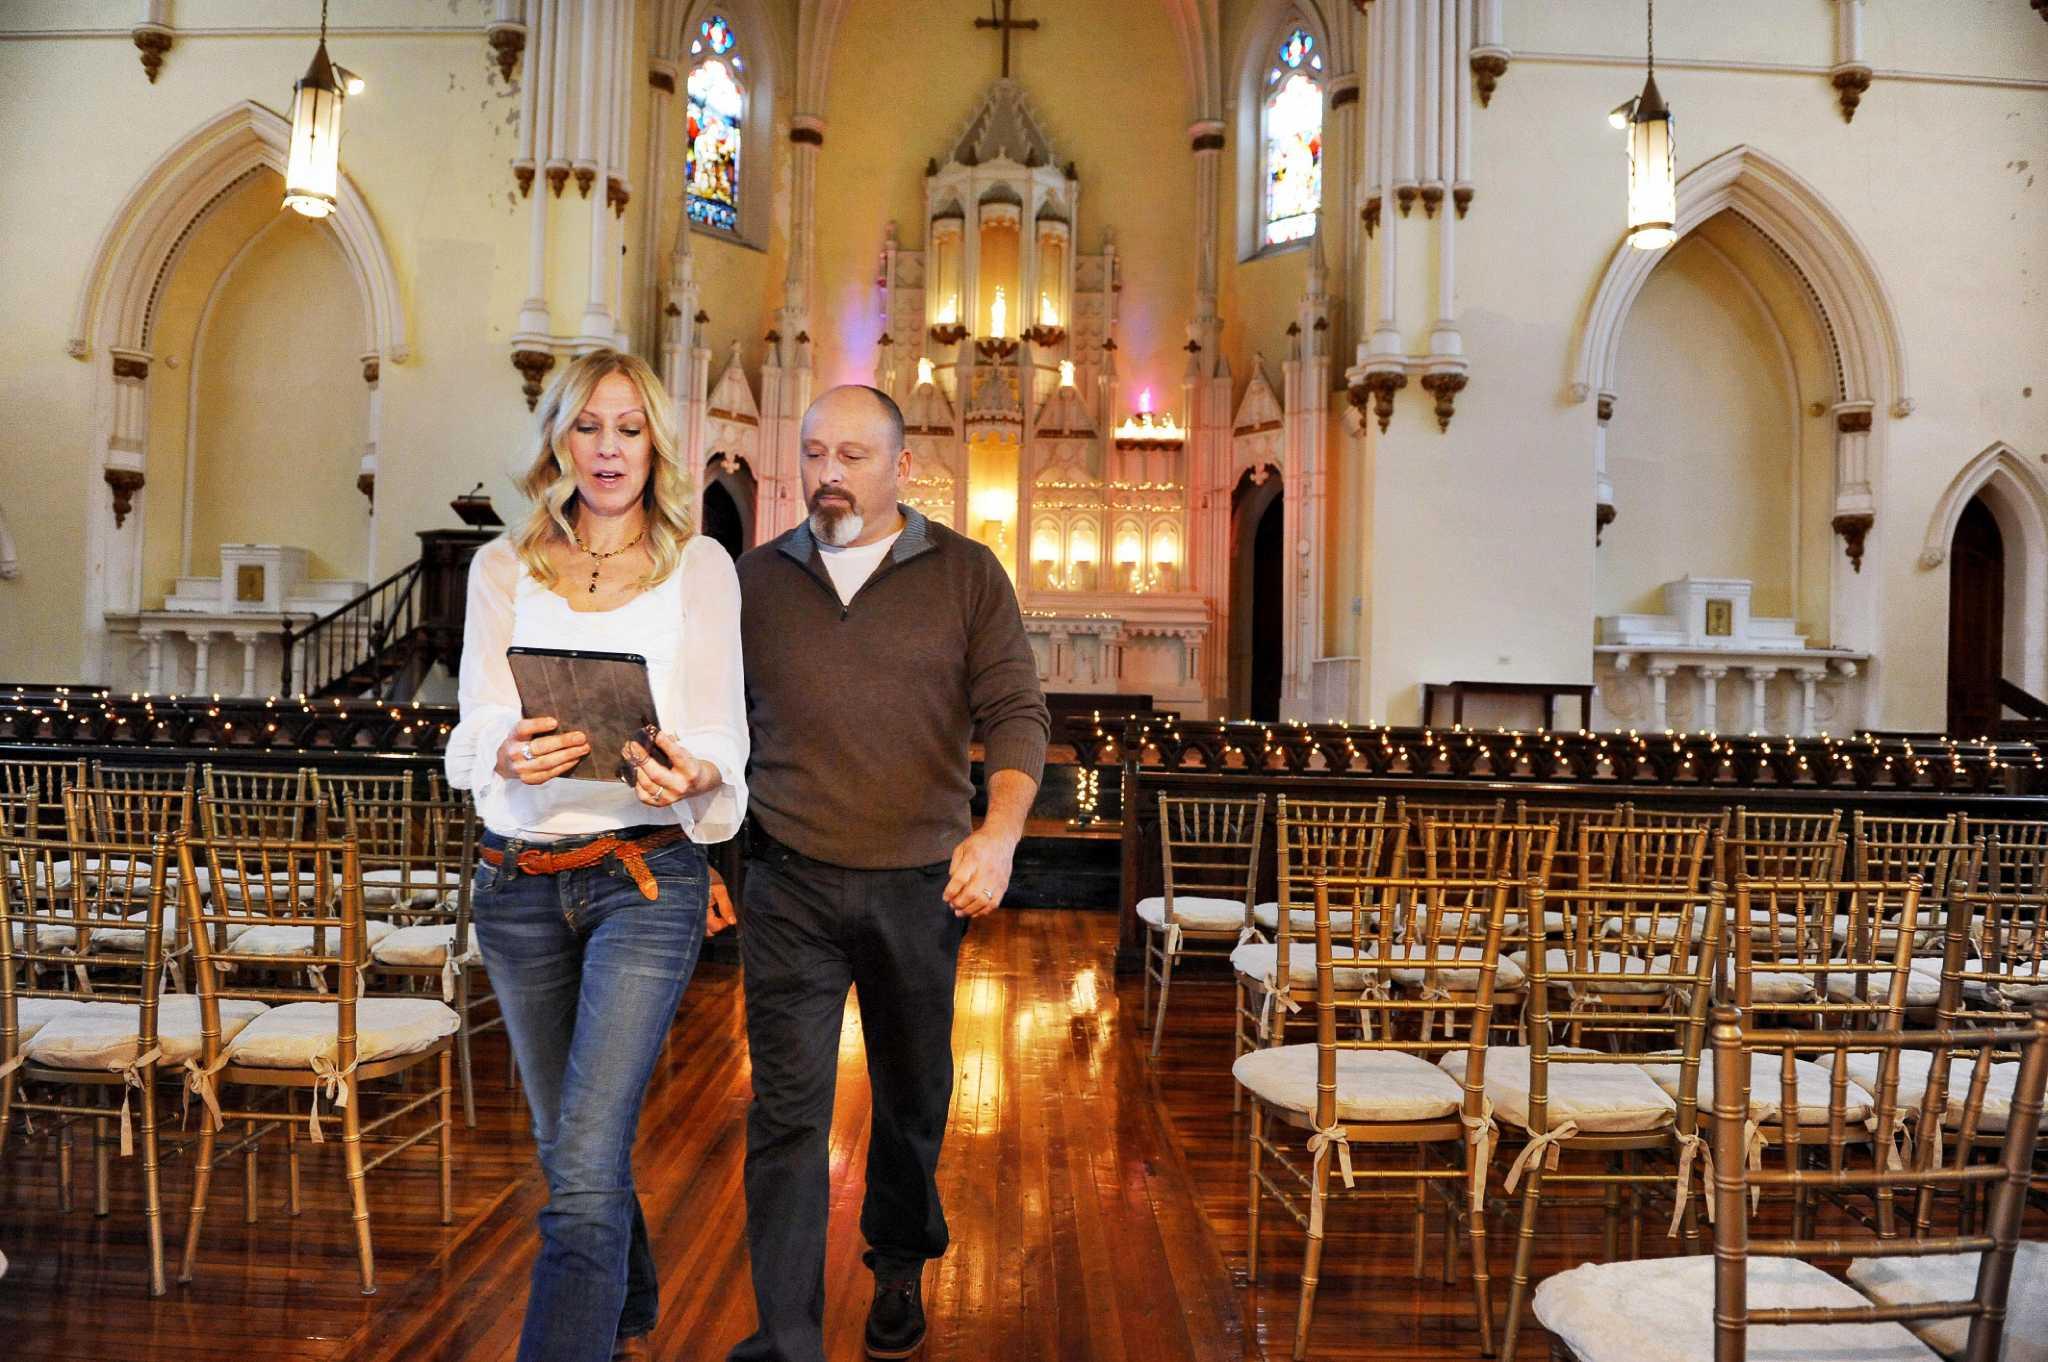 Big O Auto >> One way to find church - Times Union